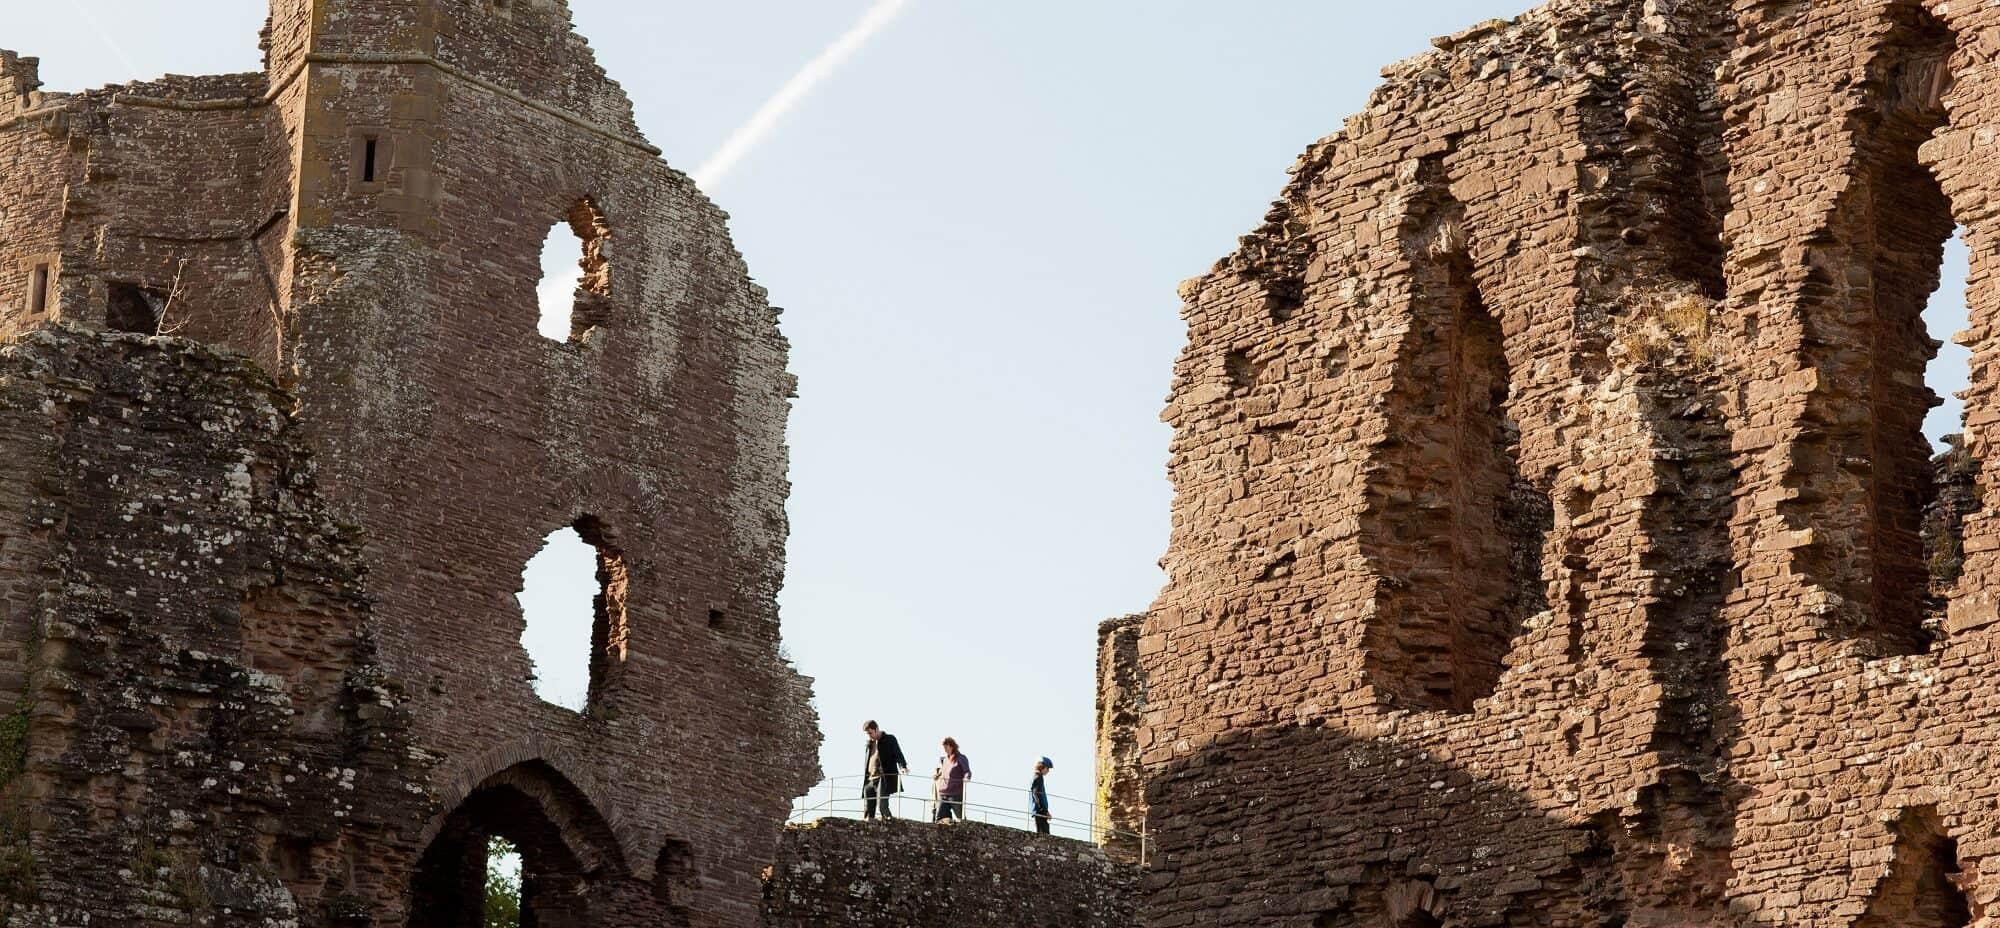 Three Castles Walk, a historical walk in Wales